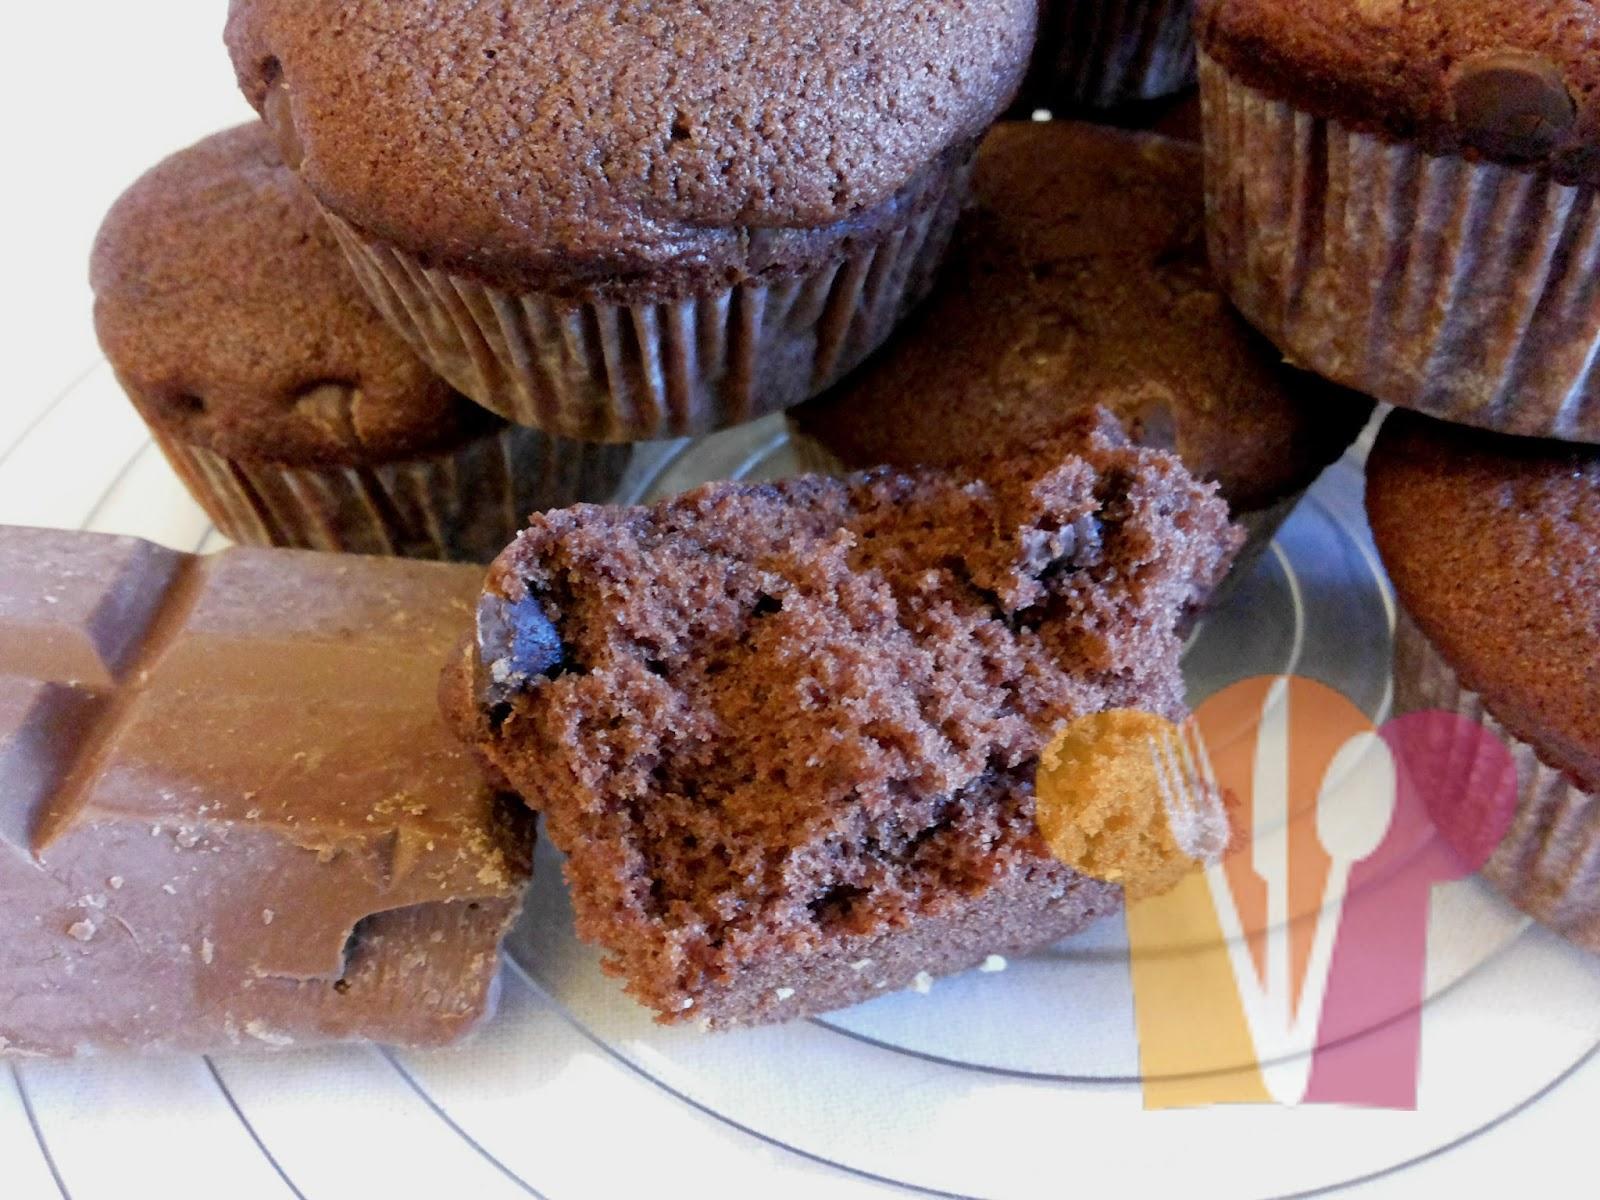 Double chocolate cupcake